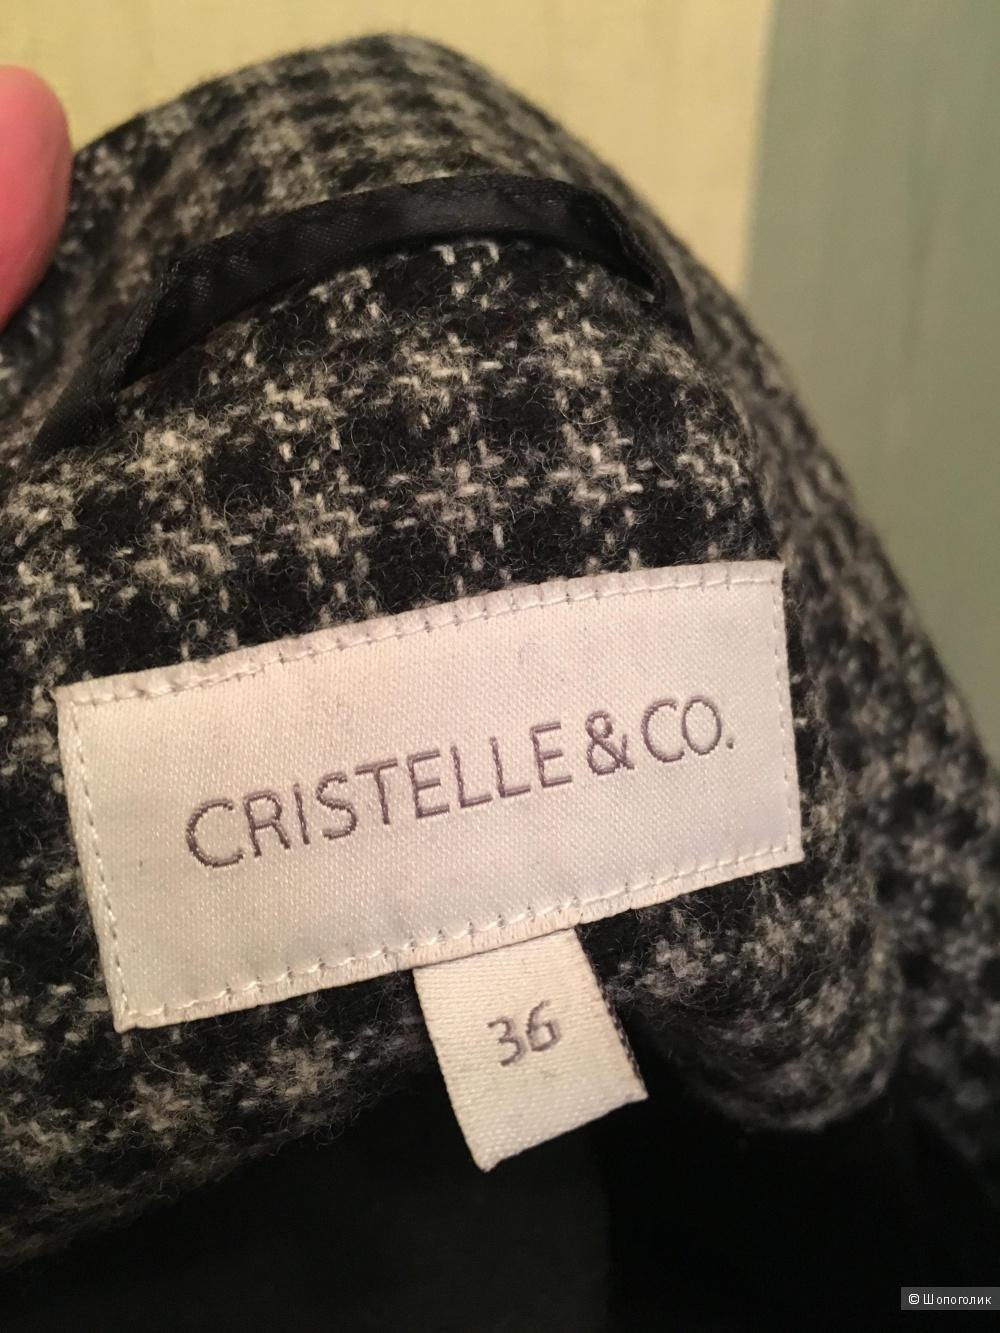 Полупальто Cristelle & Co, 42-44